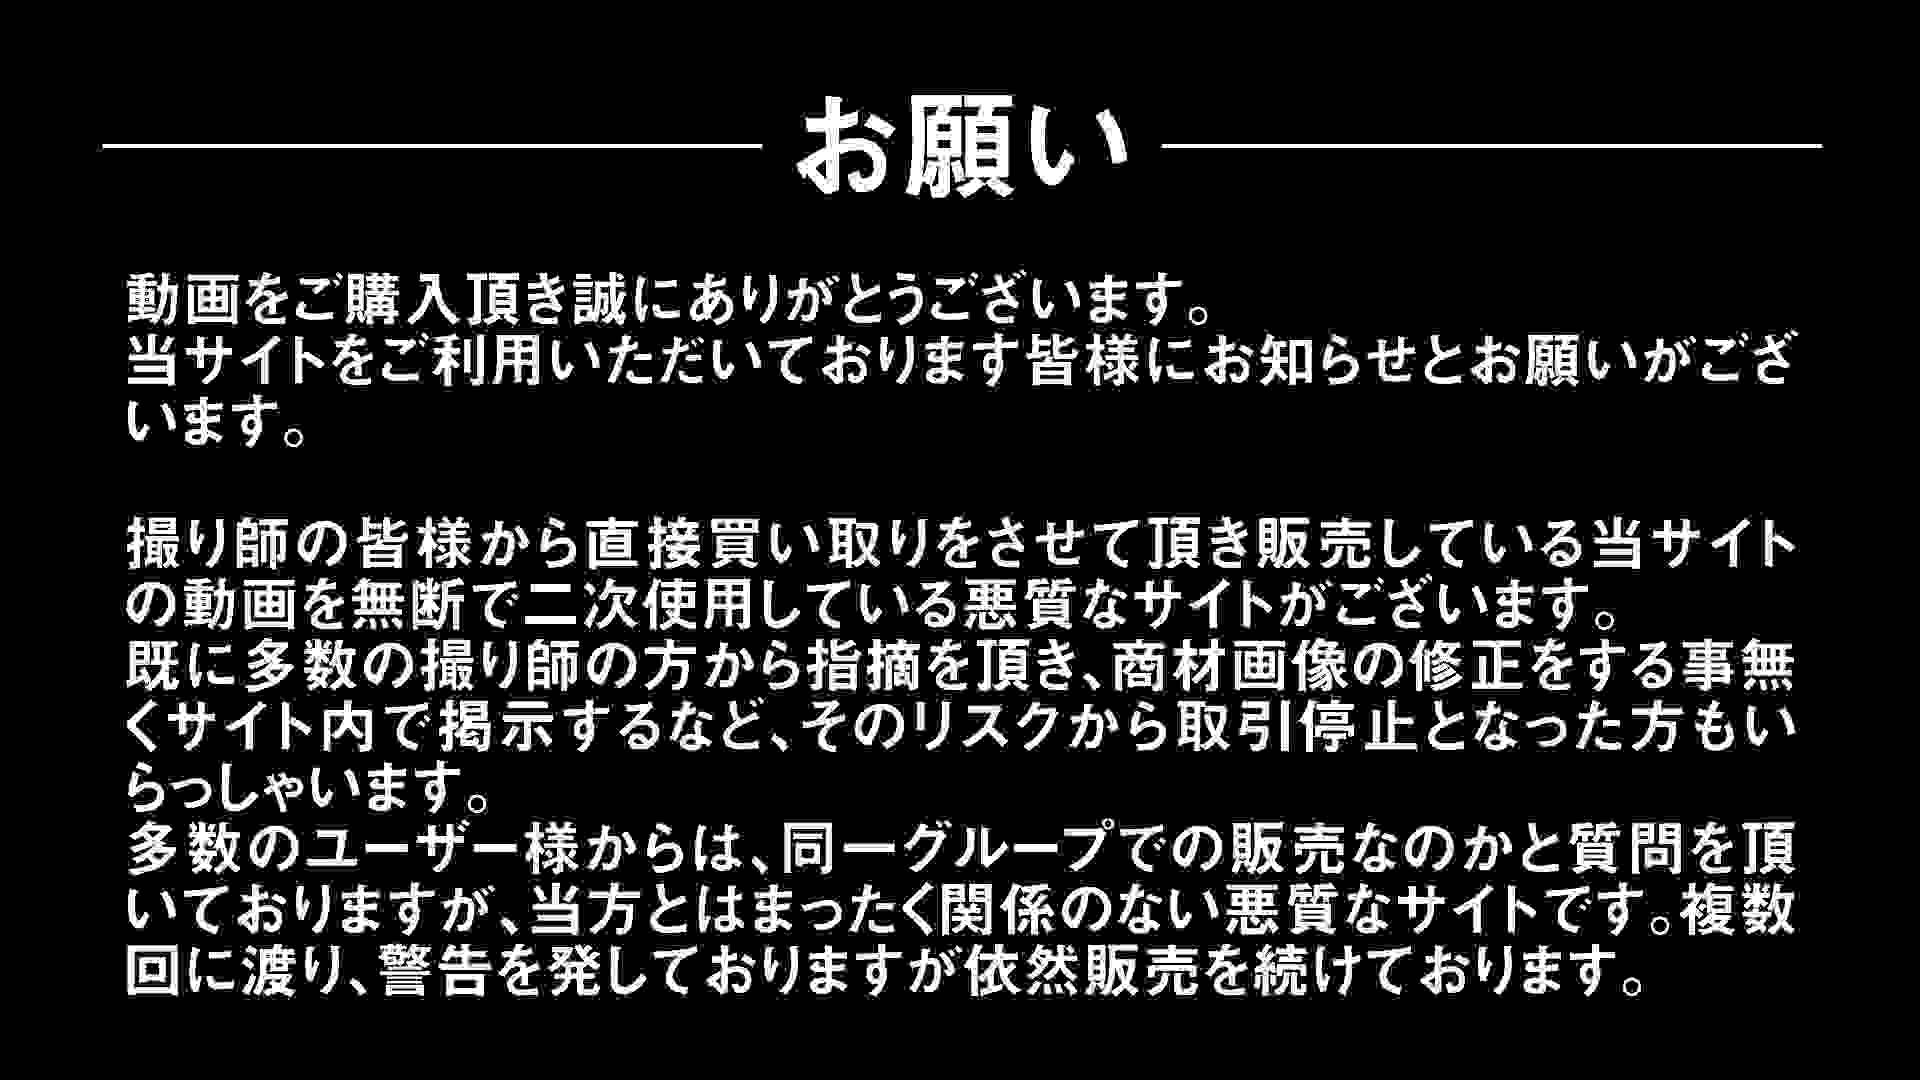 Aquaな露天風呂Vol.296 盗撮シリーズ   露天風呂編  102PIX 25